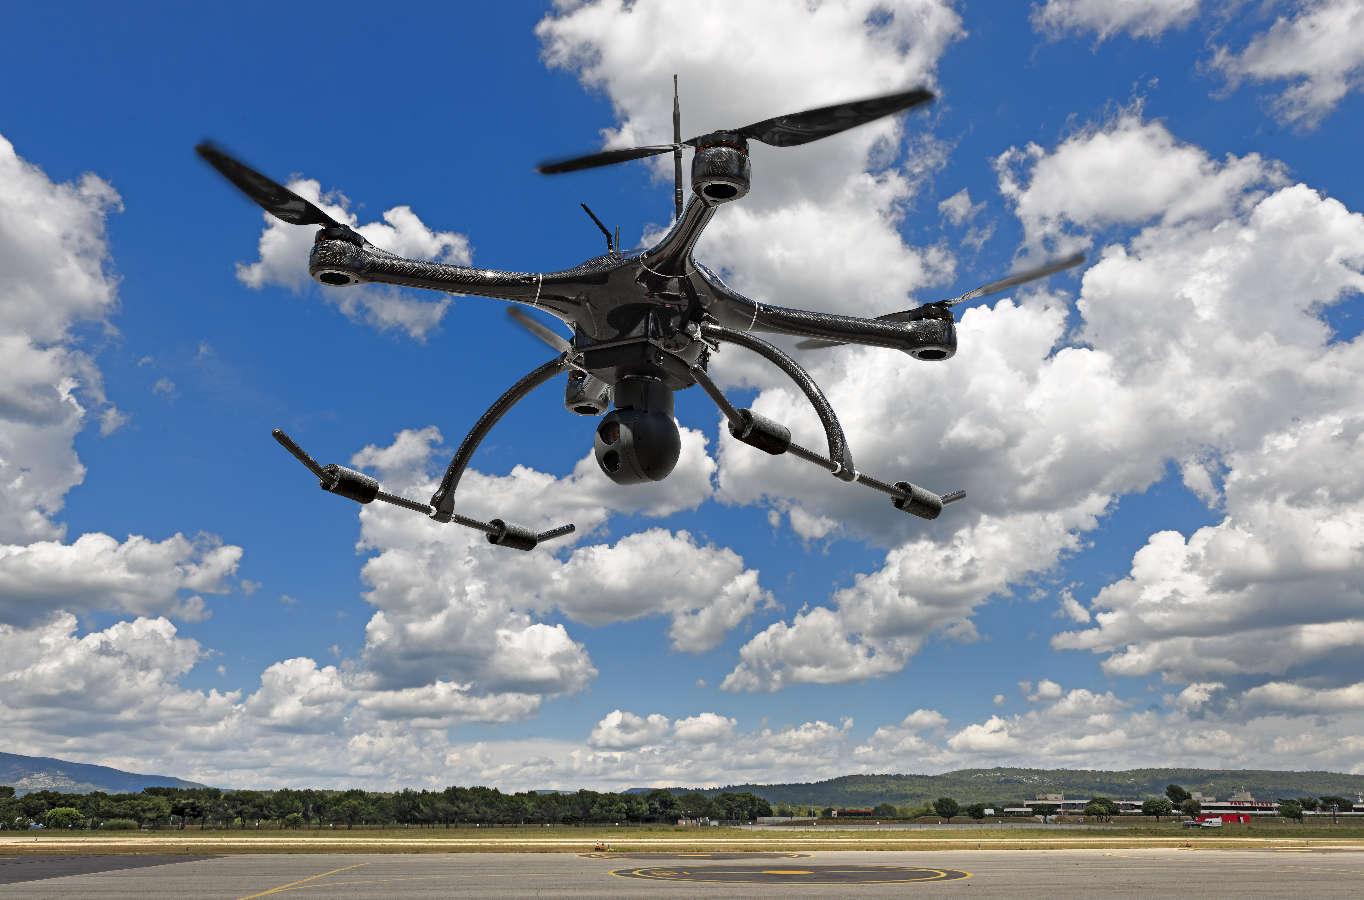 Azur Drones rachète Flying Eye